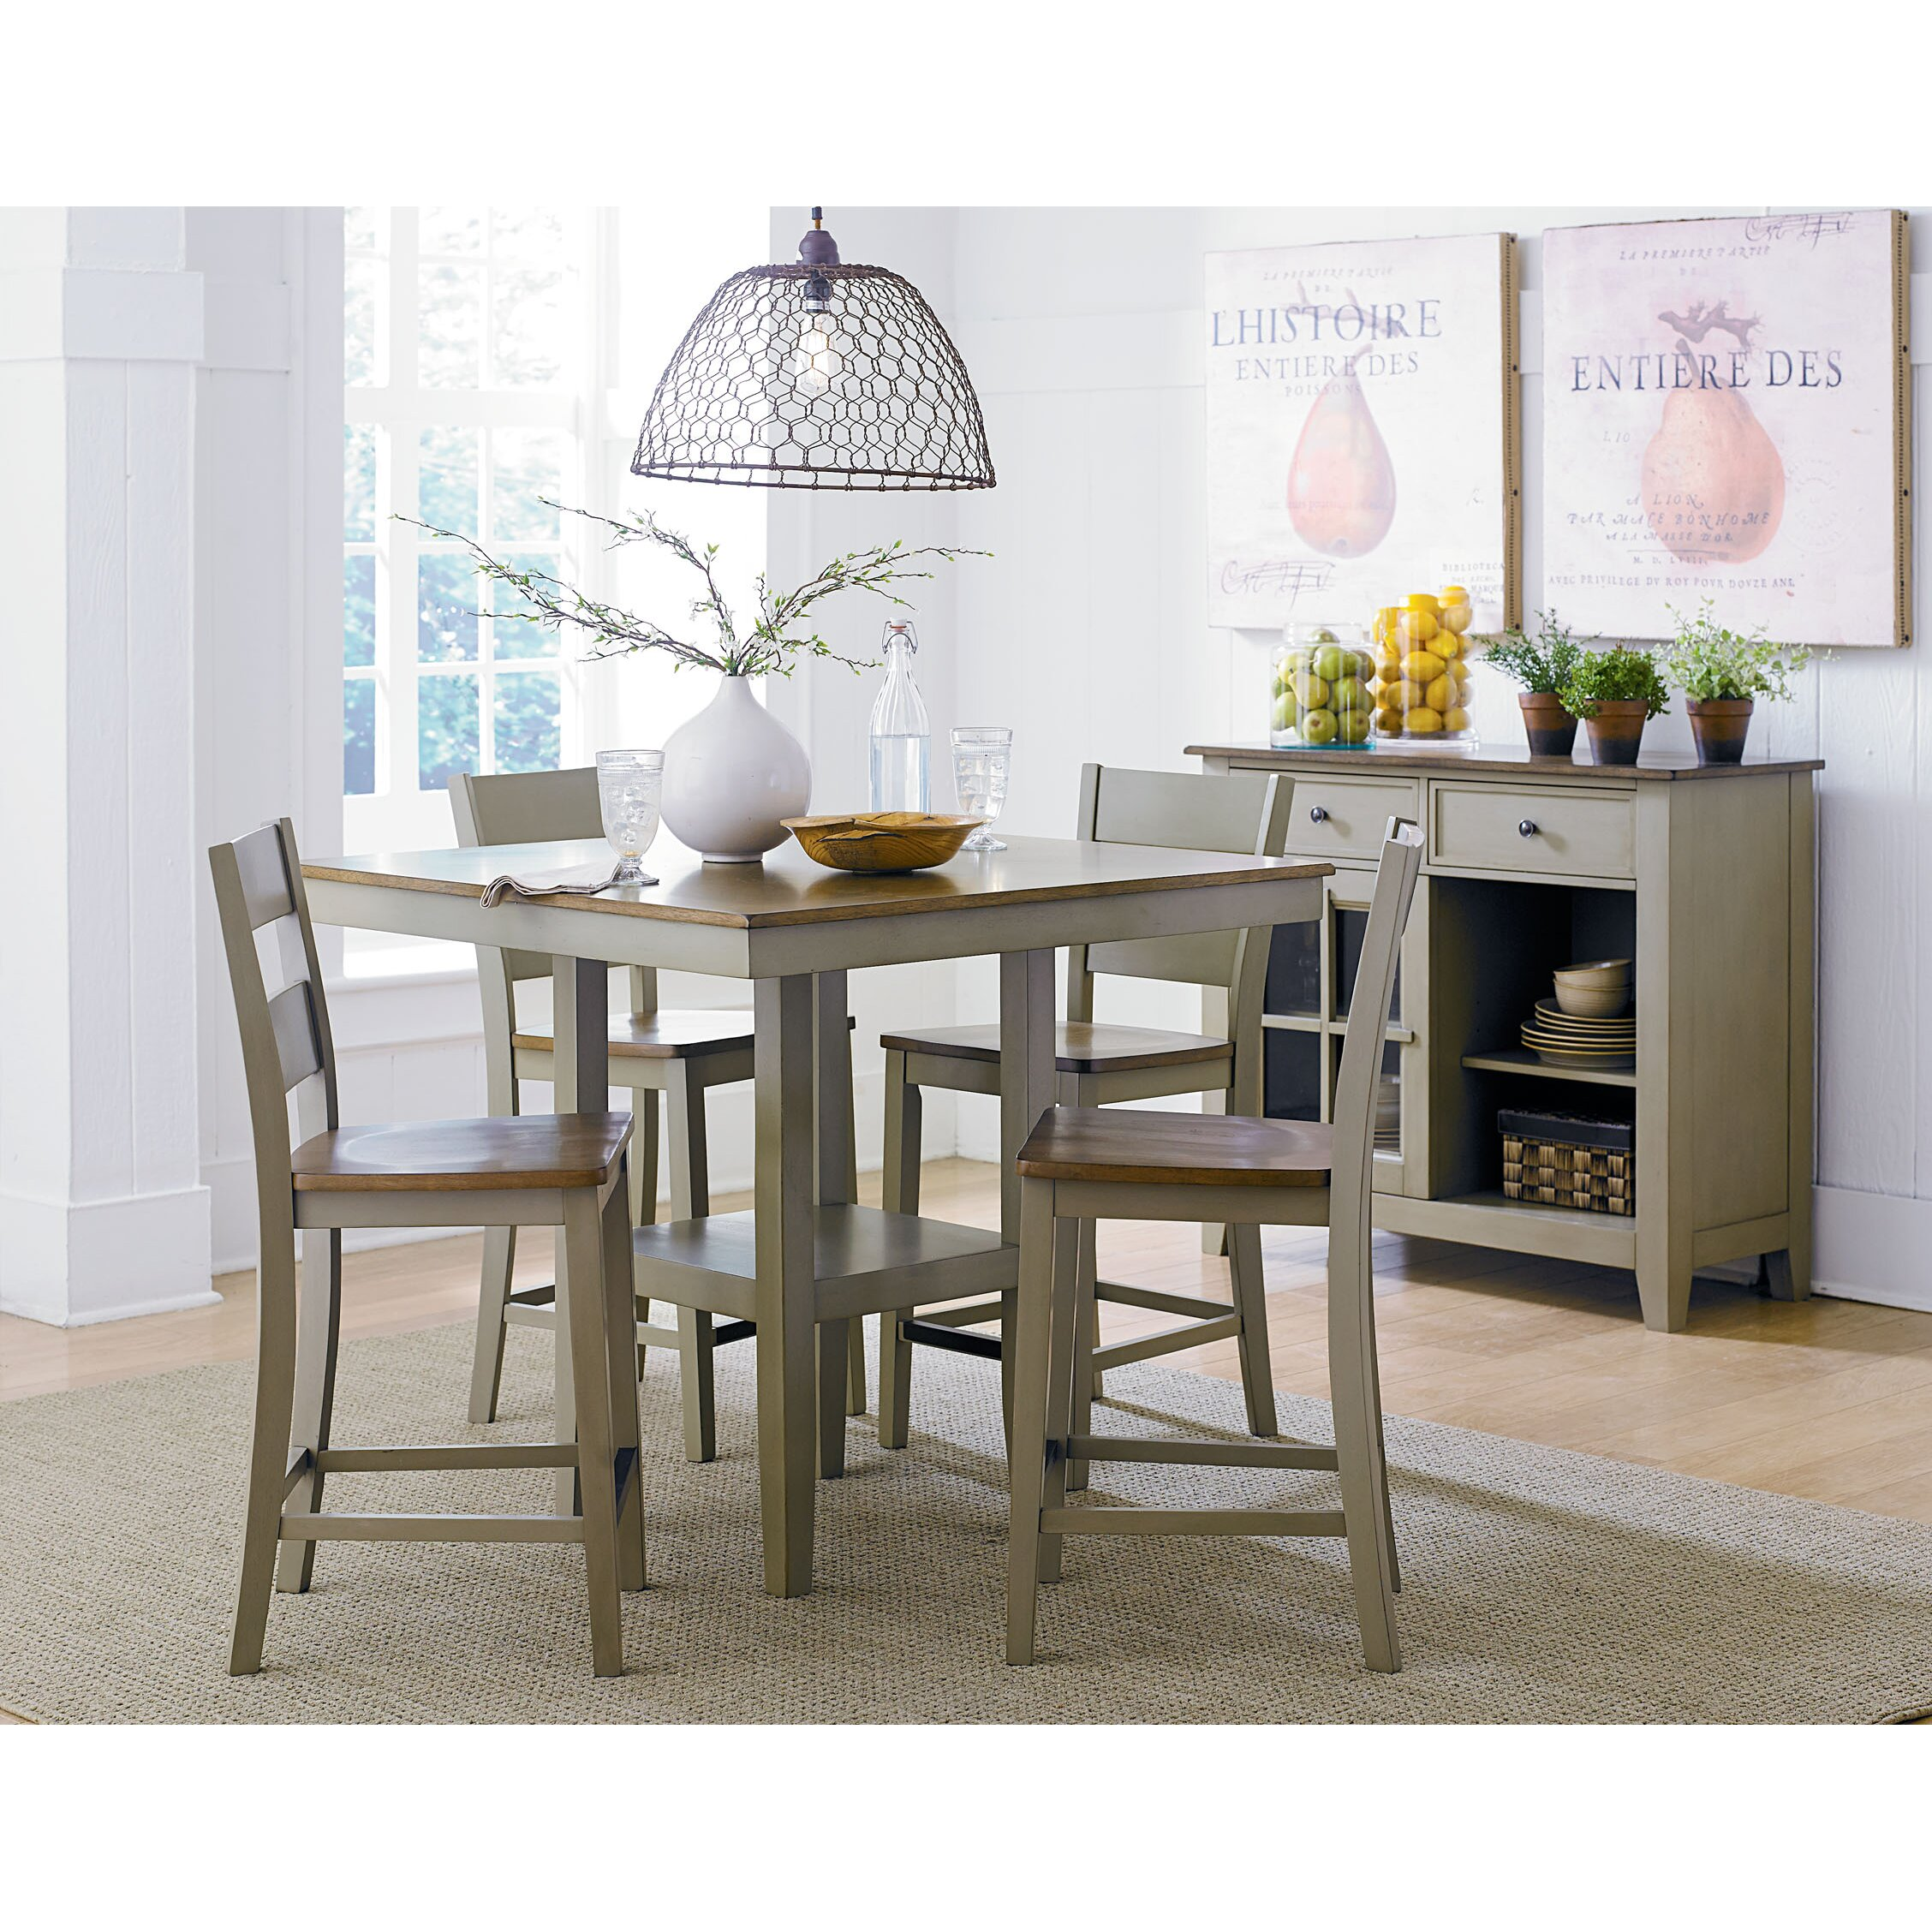 Standard Furniture Brooklyn 5 Piece Counter Height Dining: Pendleton Sage 5 Piece Counter Height Dining Set